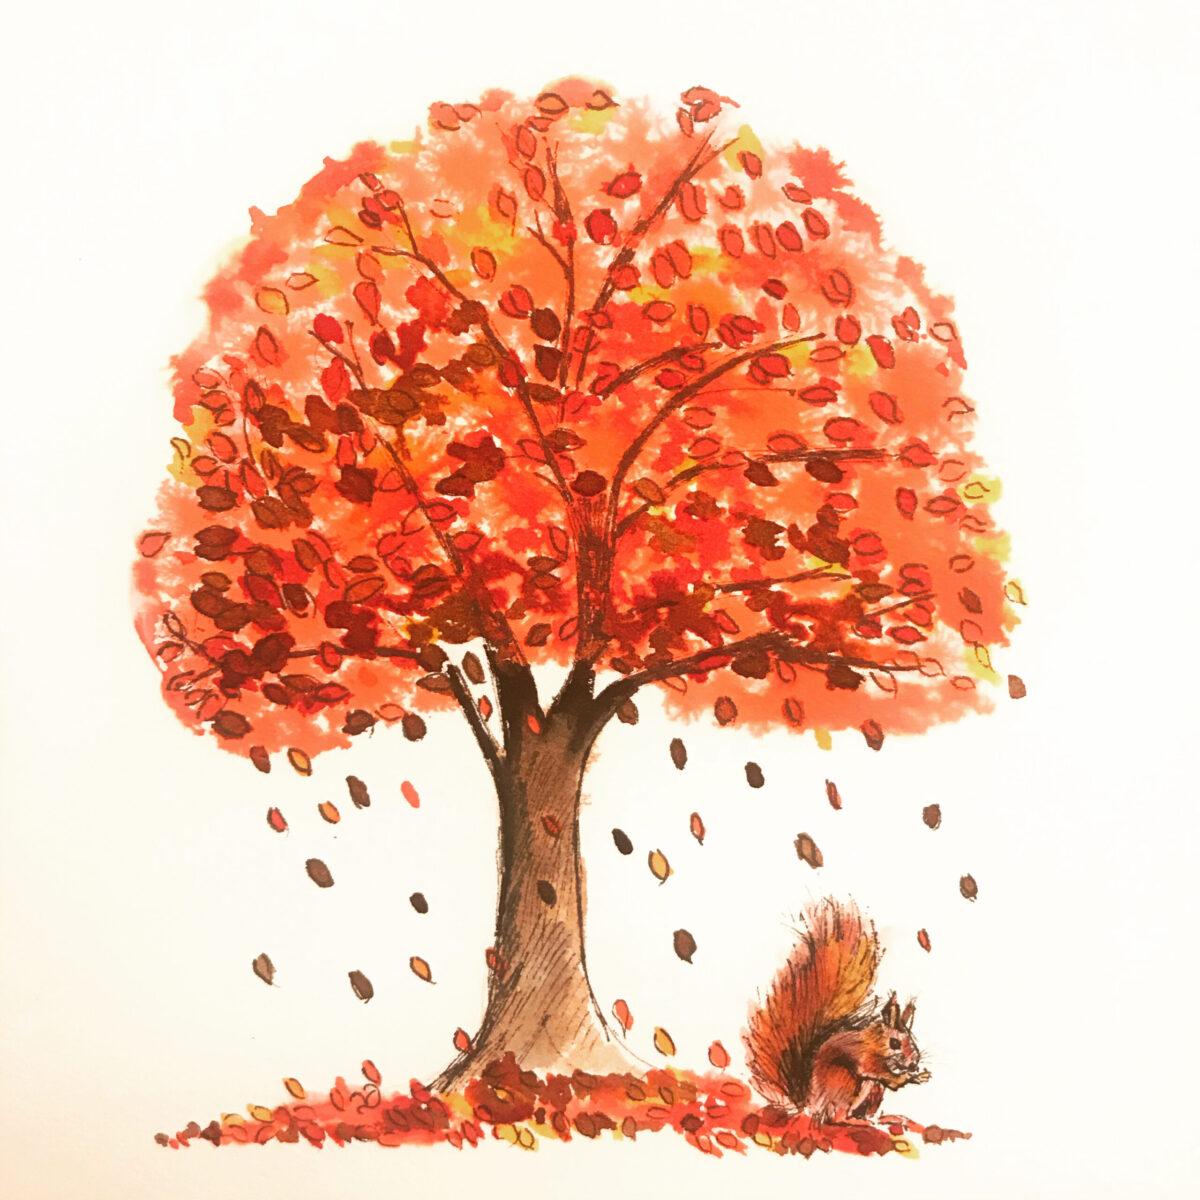 Original ink drawing by Vicki Davidson. Squirrel under tree. Autumn